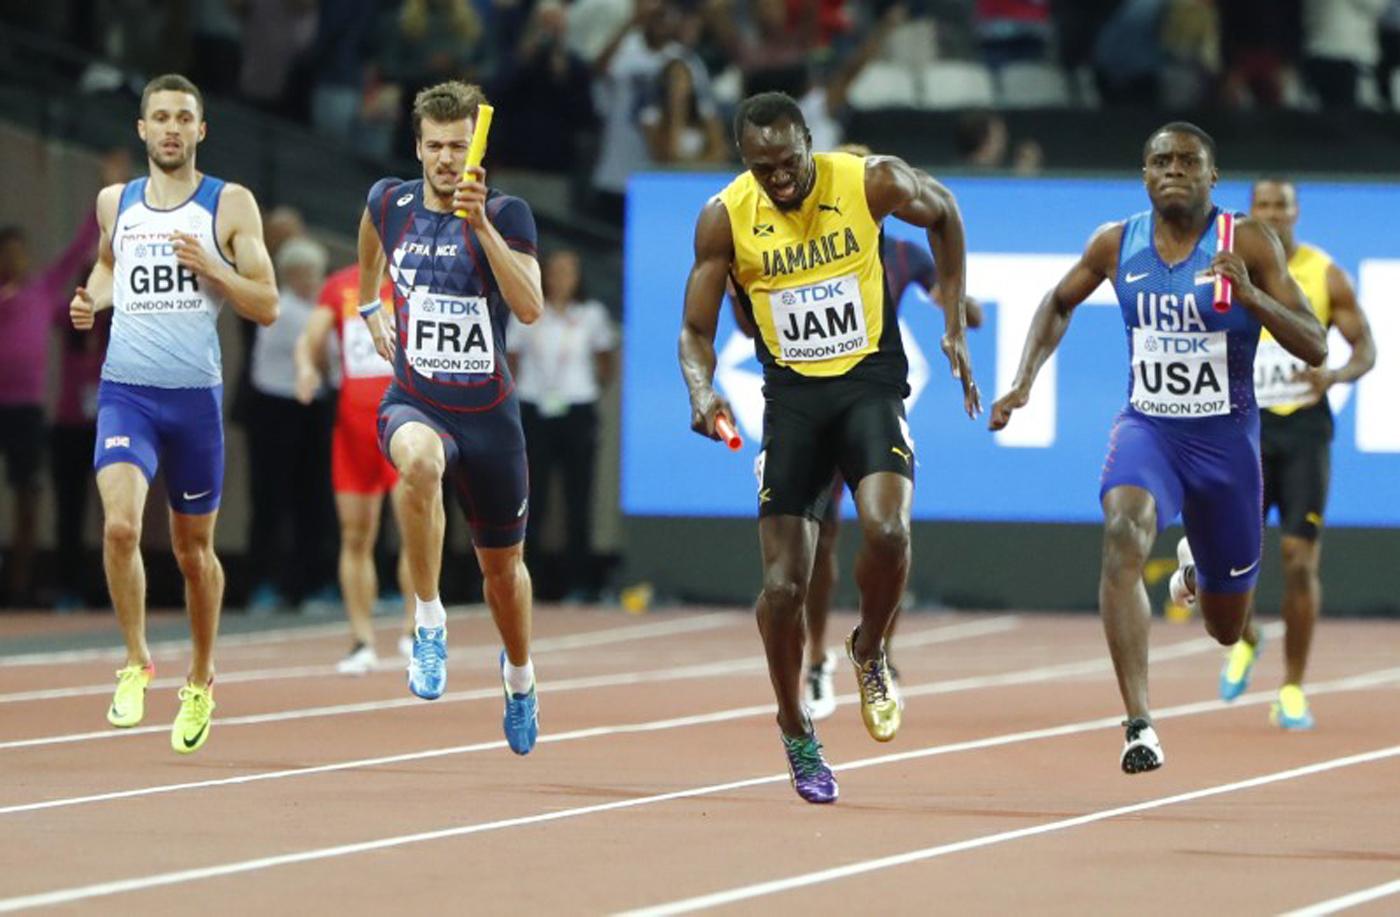 Atletismo - Campeonato Mundial de Atletismo - Final Posta Masculina 4x100 Metros - Estadio de Londres, Londres, Reino Unido – 12 de agosto, 2017. Usain Bolt de Jamaica sufre una lesión. REUTERS/Lucy Nicholson